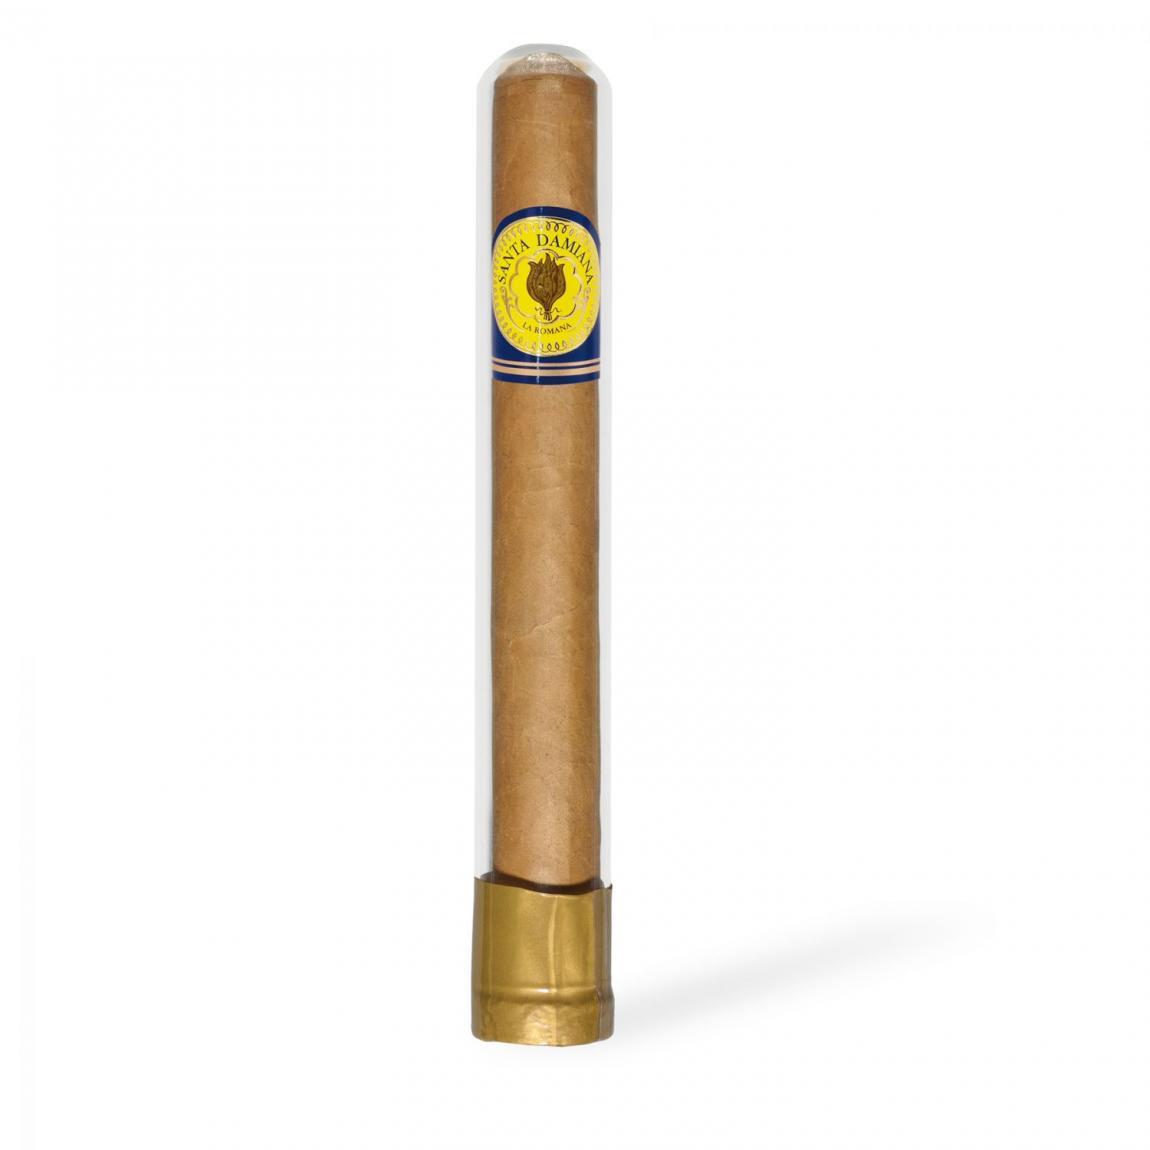 Santa Damiana »Classic« Coronas Glass Tubes 10er Kiste